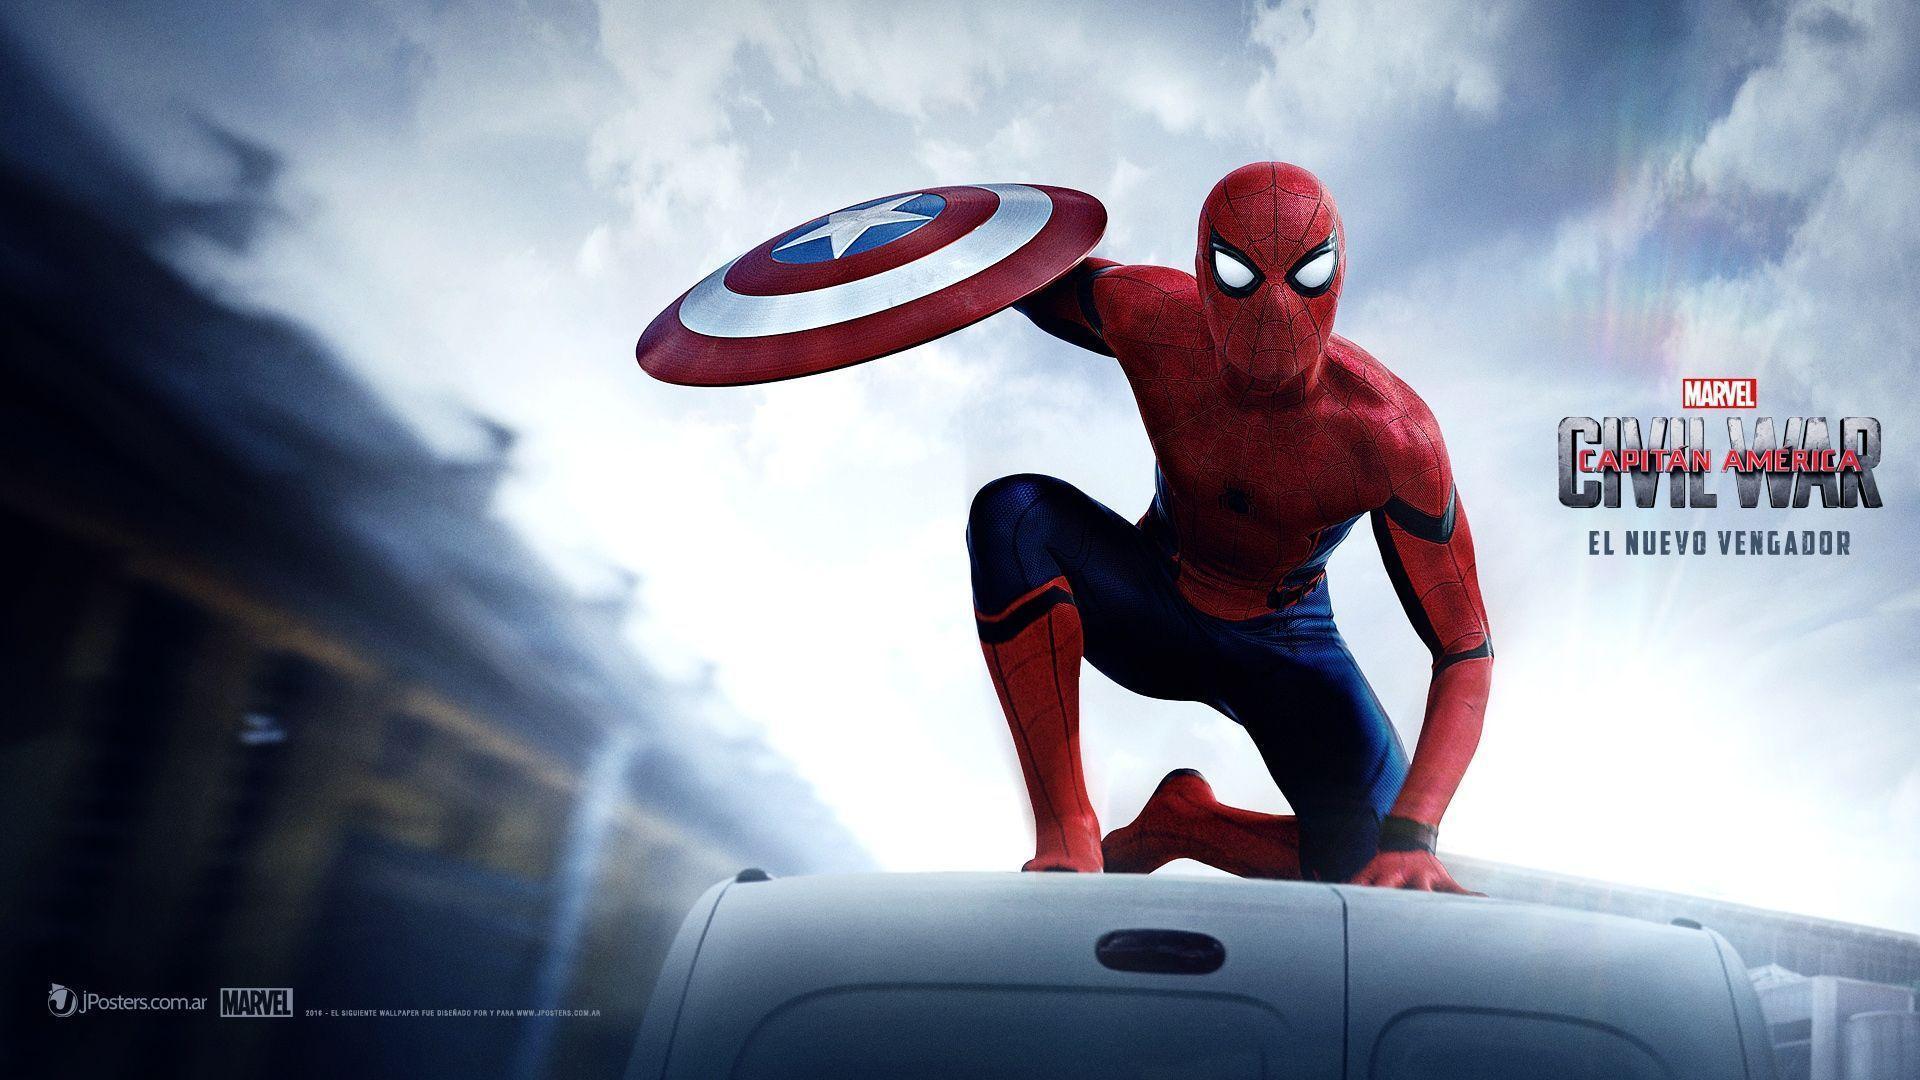 Spiderman 2016 Wallpapers Wallpaper Cave